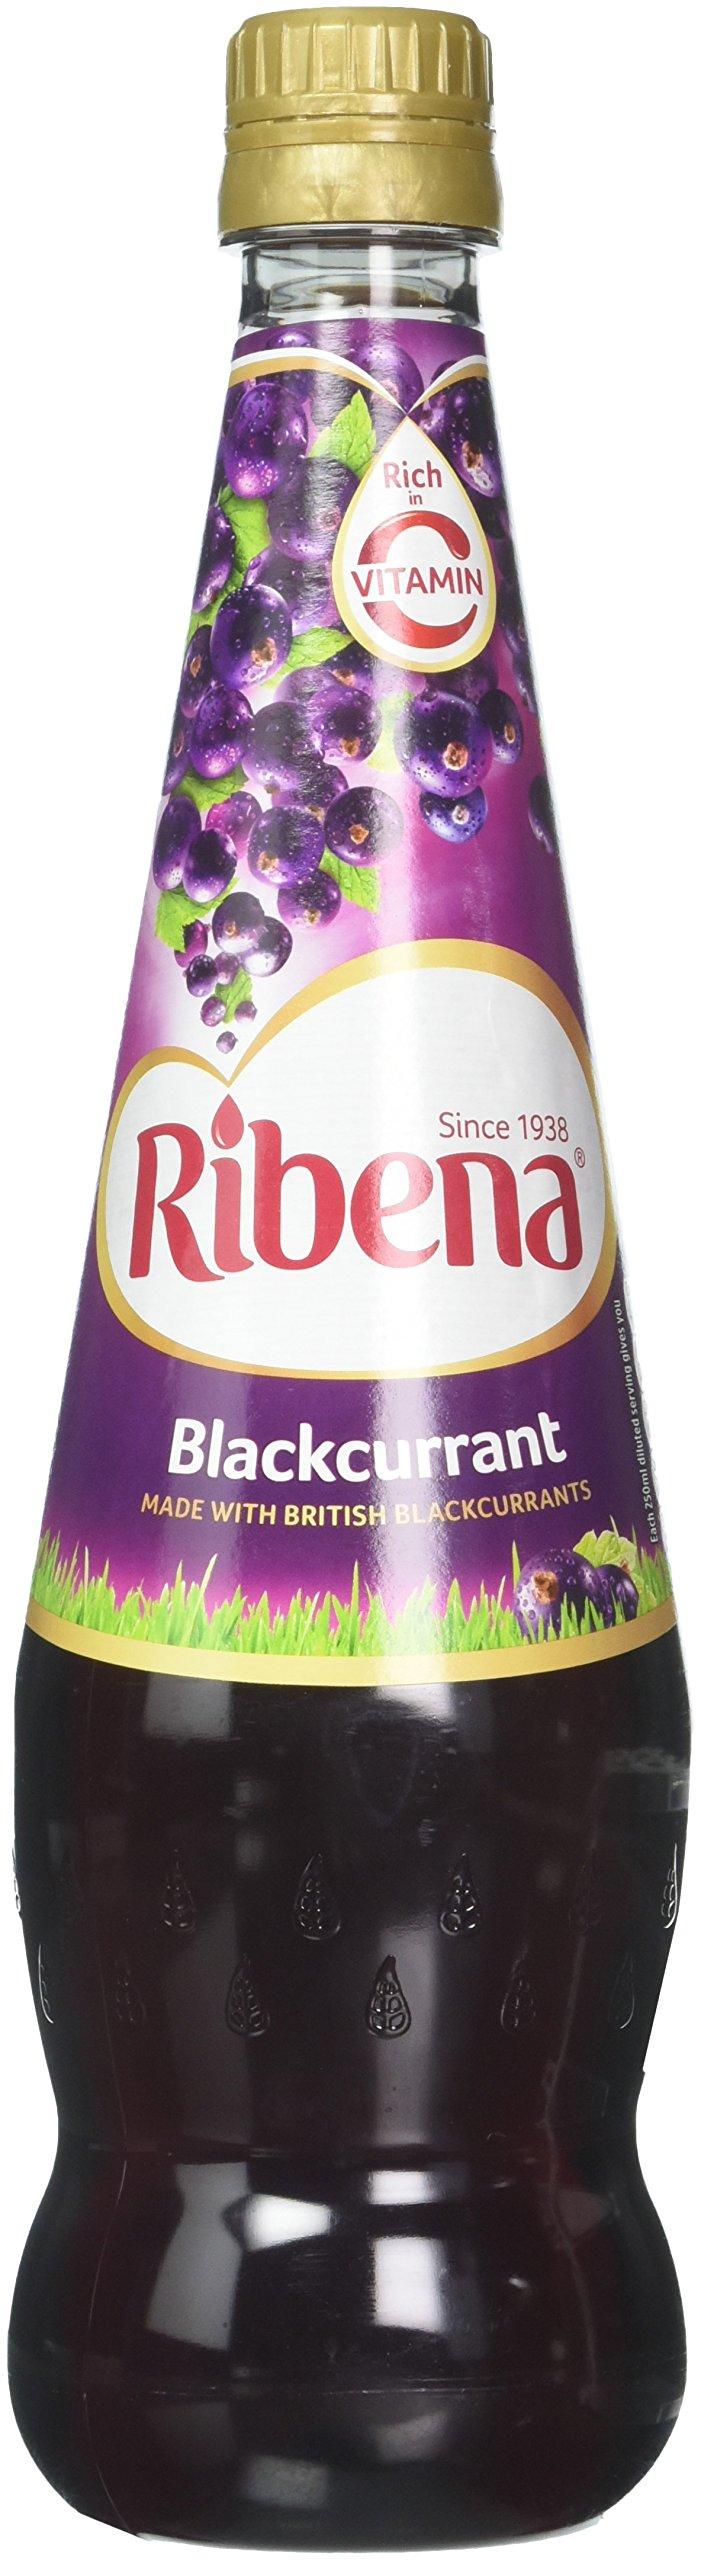 Ribena - 850ml - (4 Pack)